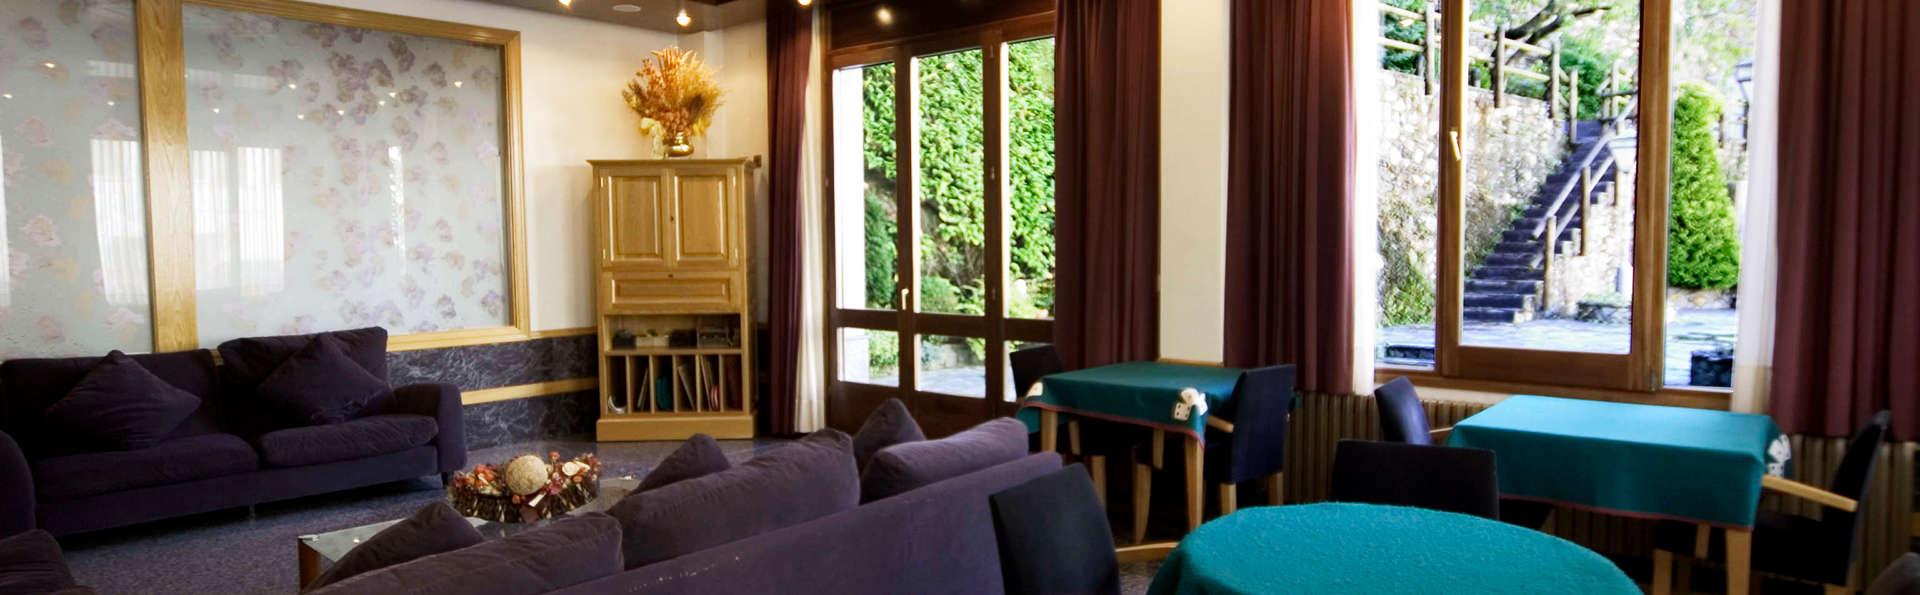 Hotel Sant Antoni - EDIT_salon.jpg